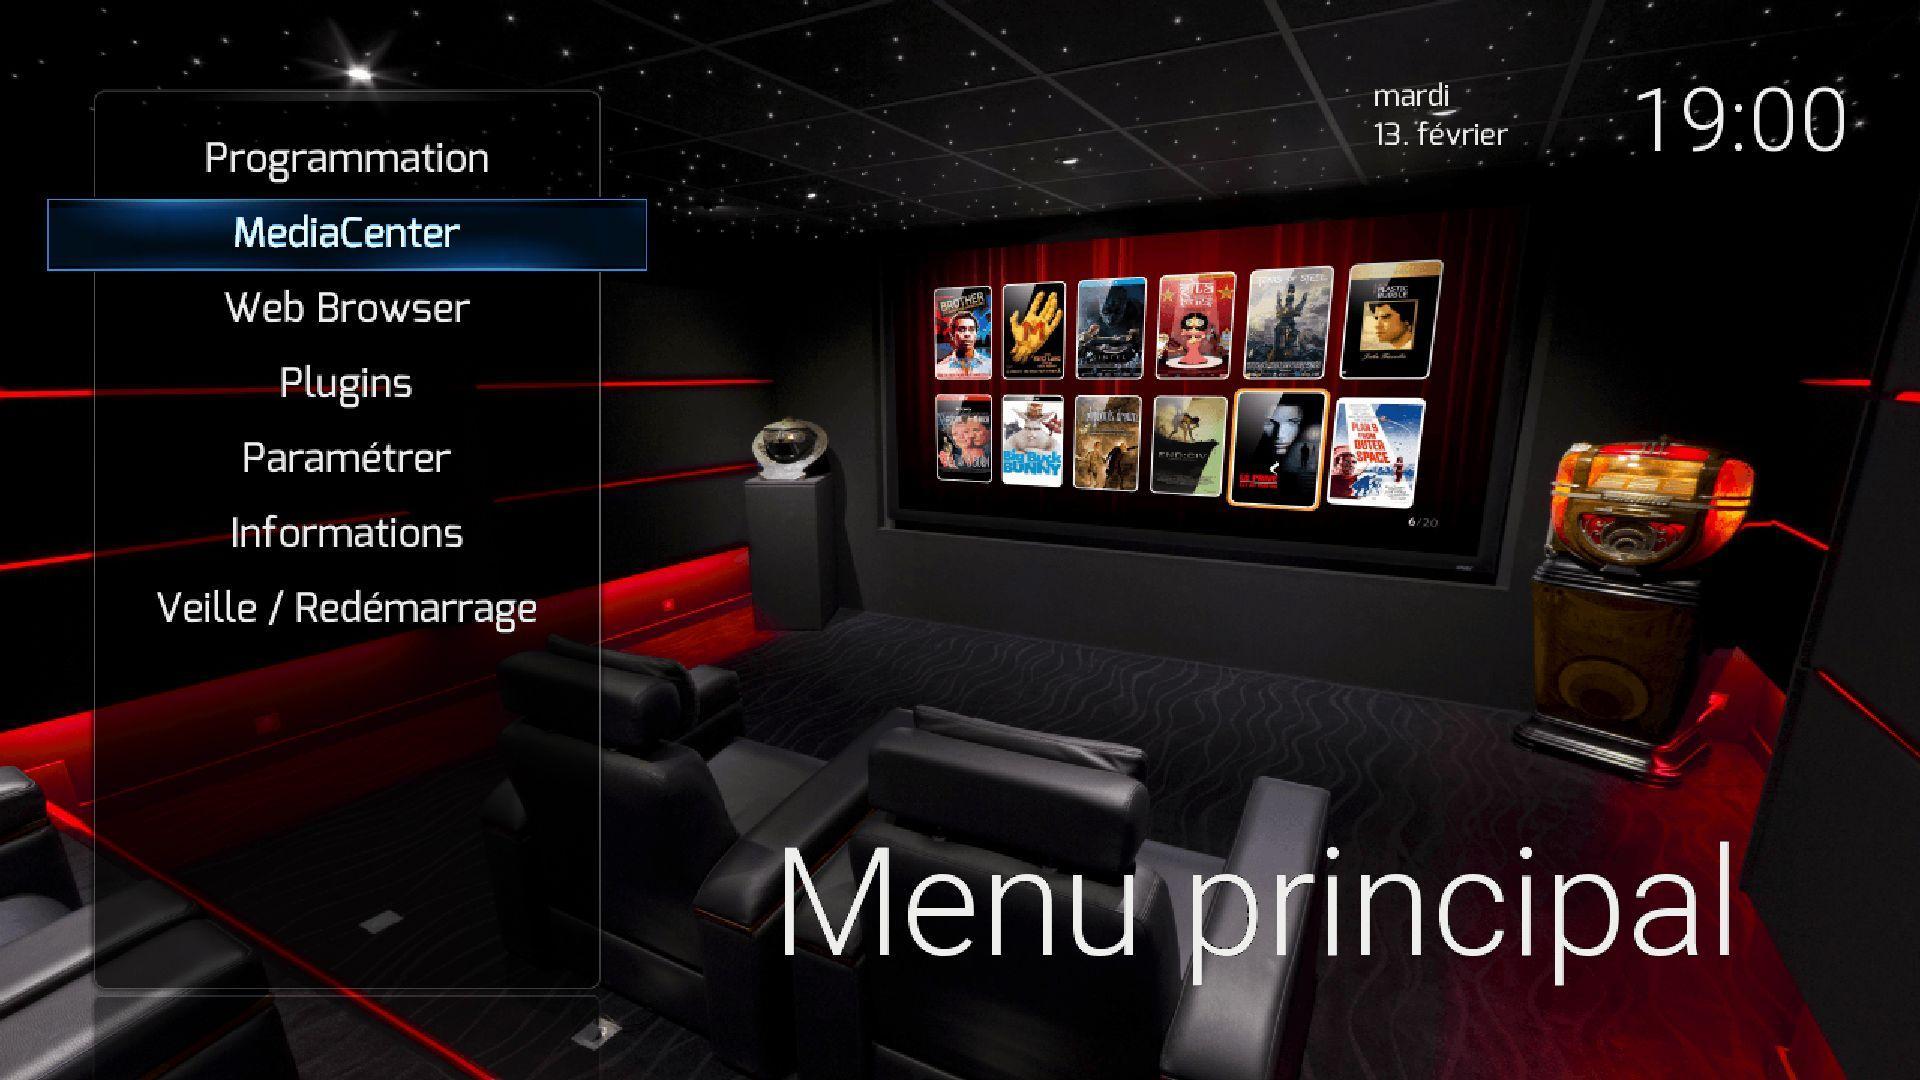 Backup Dream-Elite-6 0-DM920-UHD-MetrixStyleHD-Mod-Adrenalinnrw by